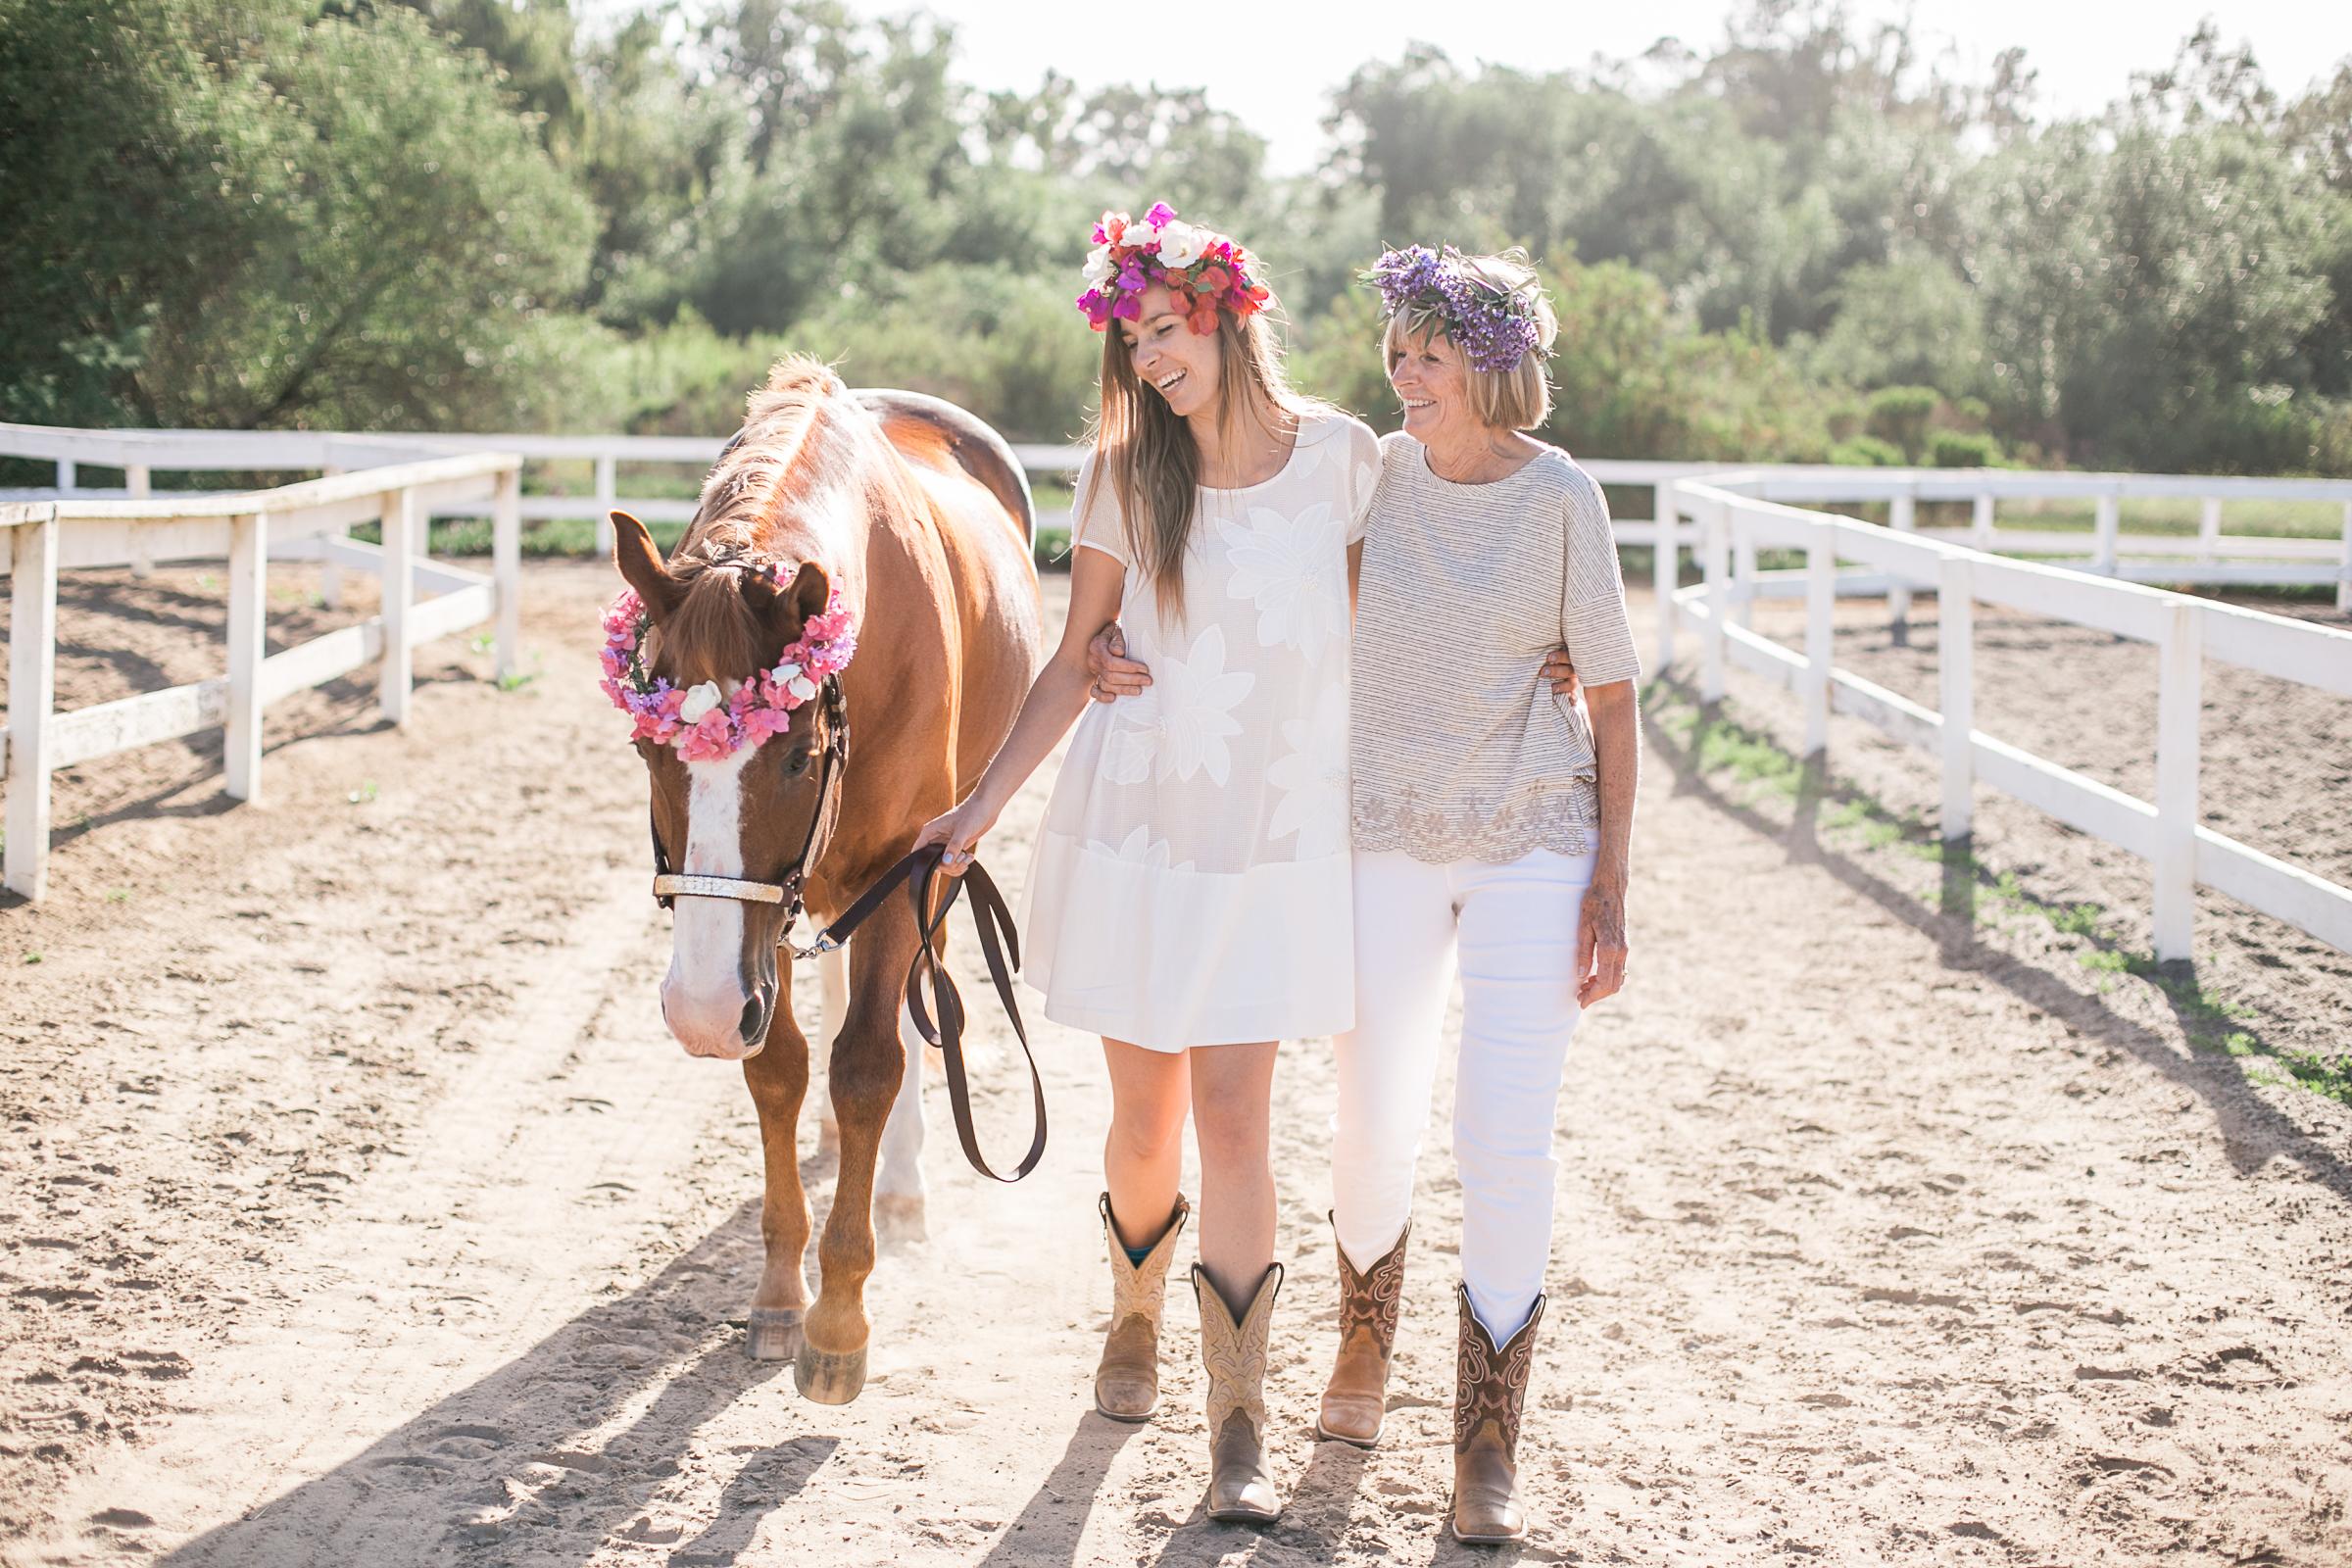 Mendola_Family _Session_Del_Mar_Equestrian_Ranch_2017-4.jpg